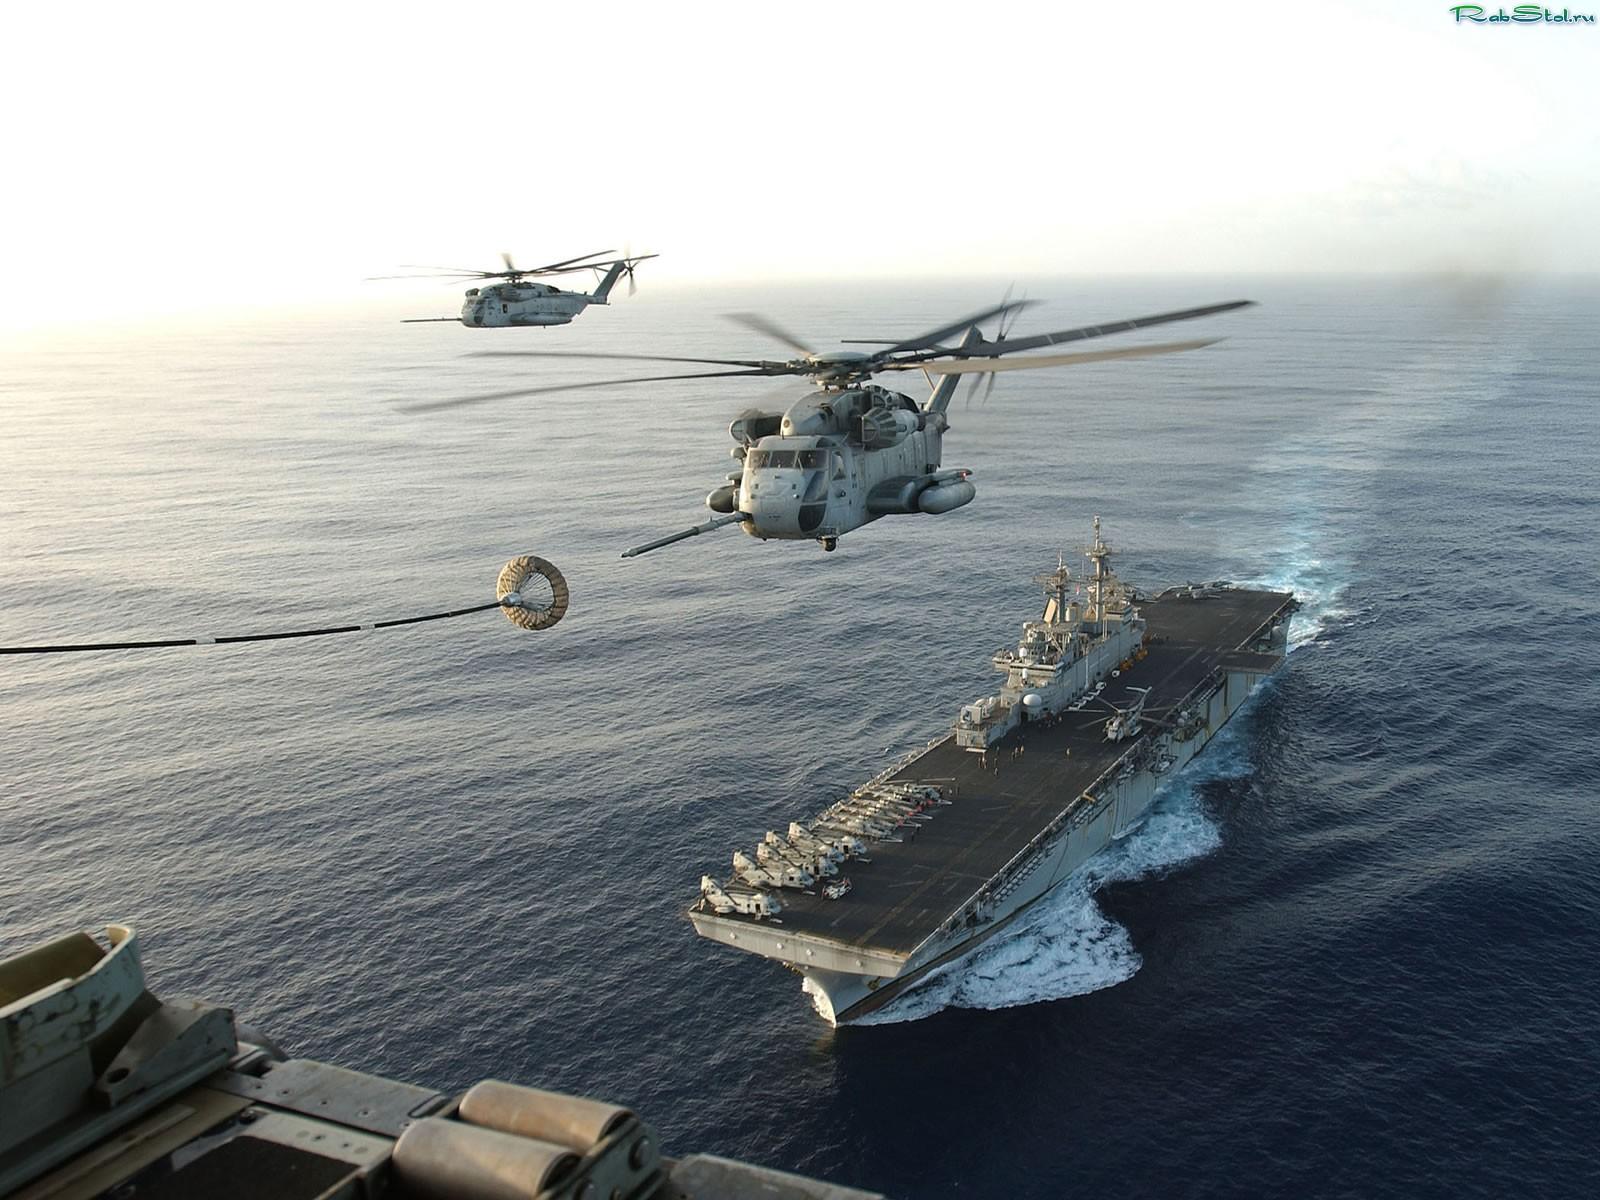 Zastaki.com - Дозаправка вертолета